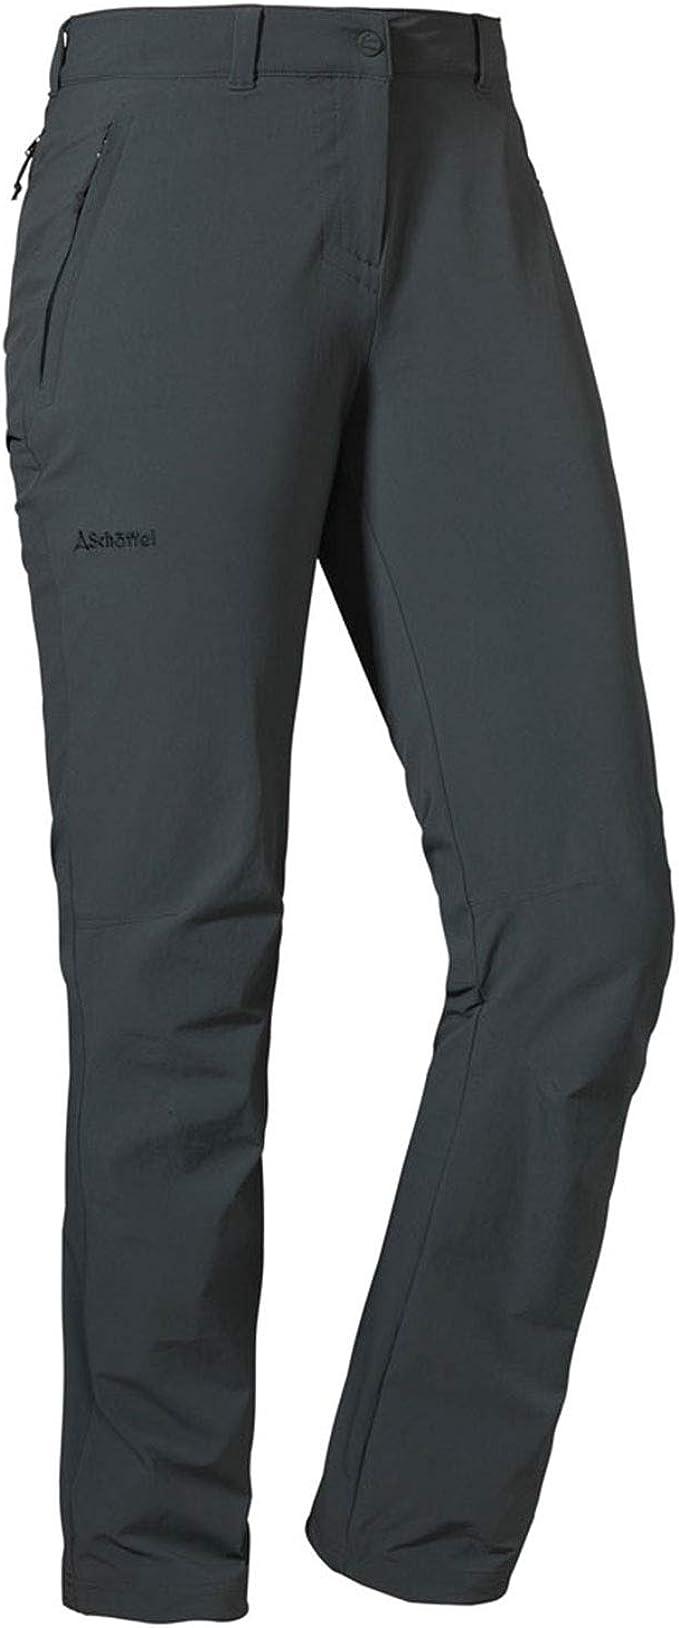 Schöffel Pants Engadin1 - Pantalones Largos. Mujer